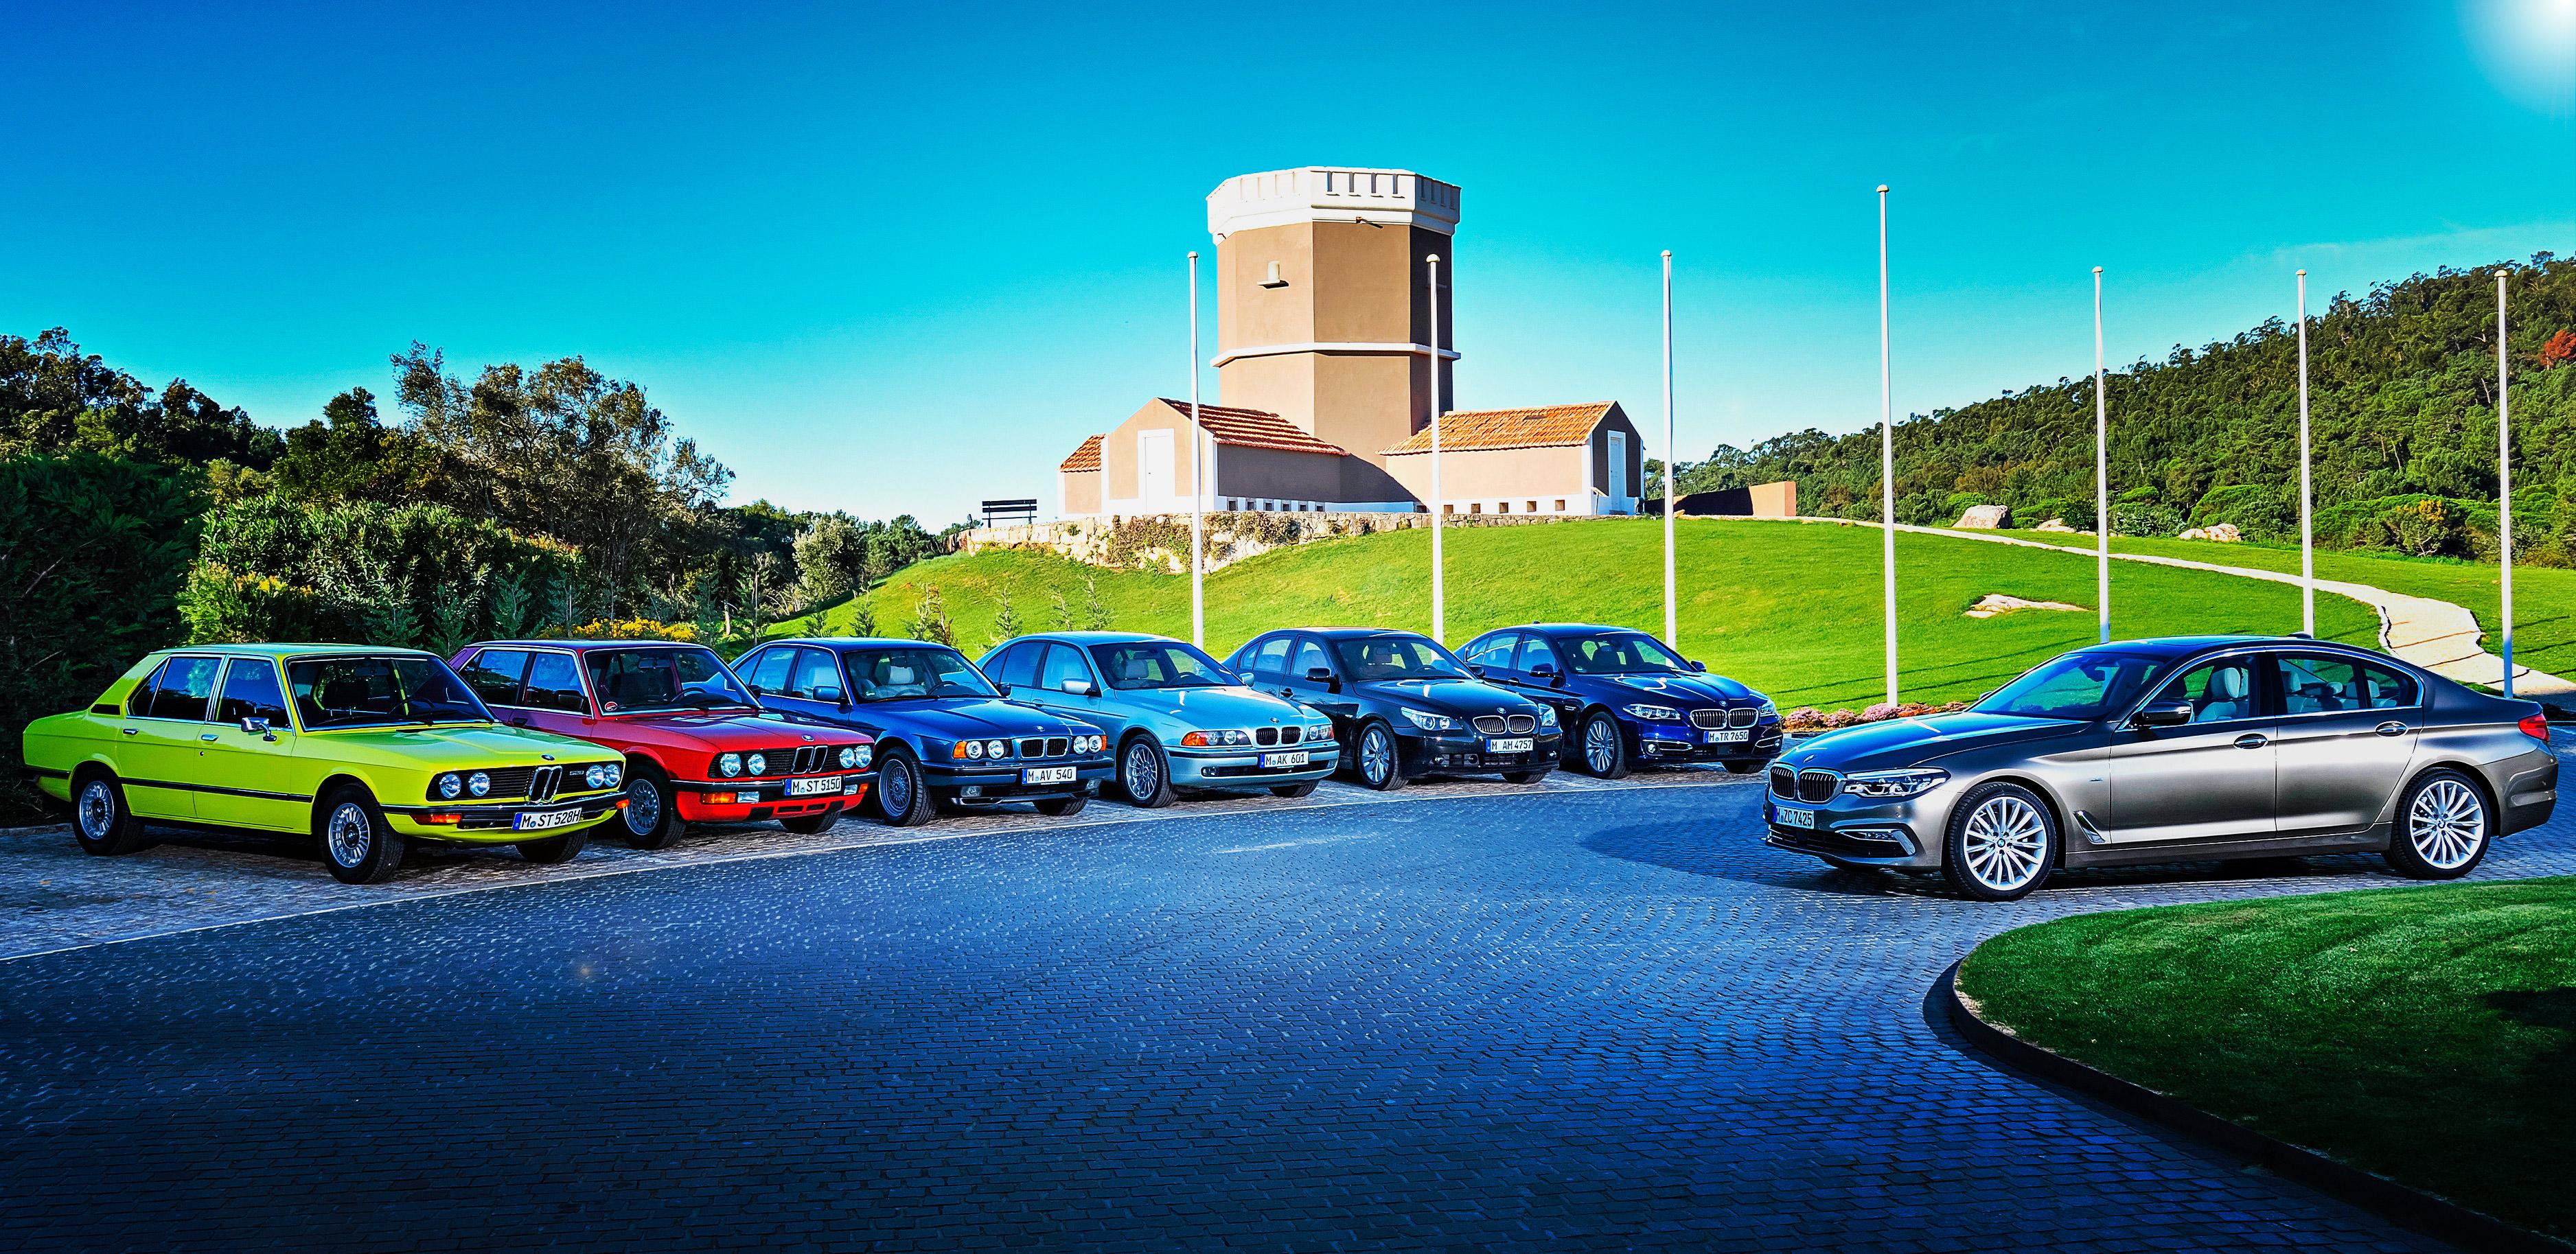 All Generations Of Bmw 5 Series Driving E12 E28 E34 E39 E60 F10 And New G30